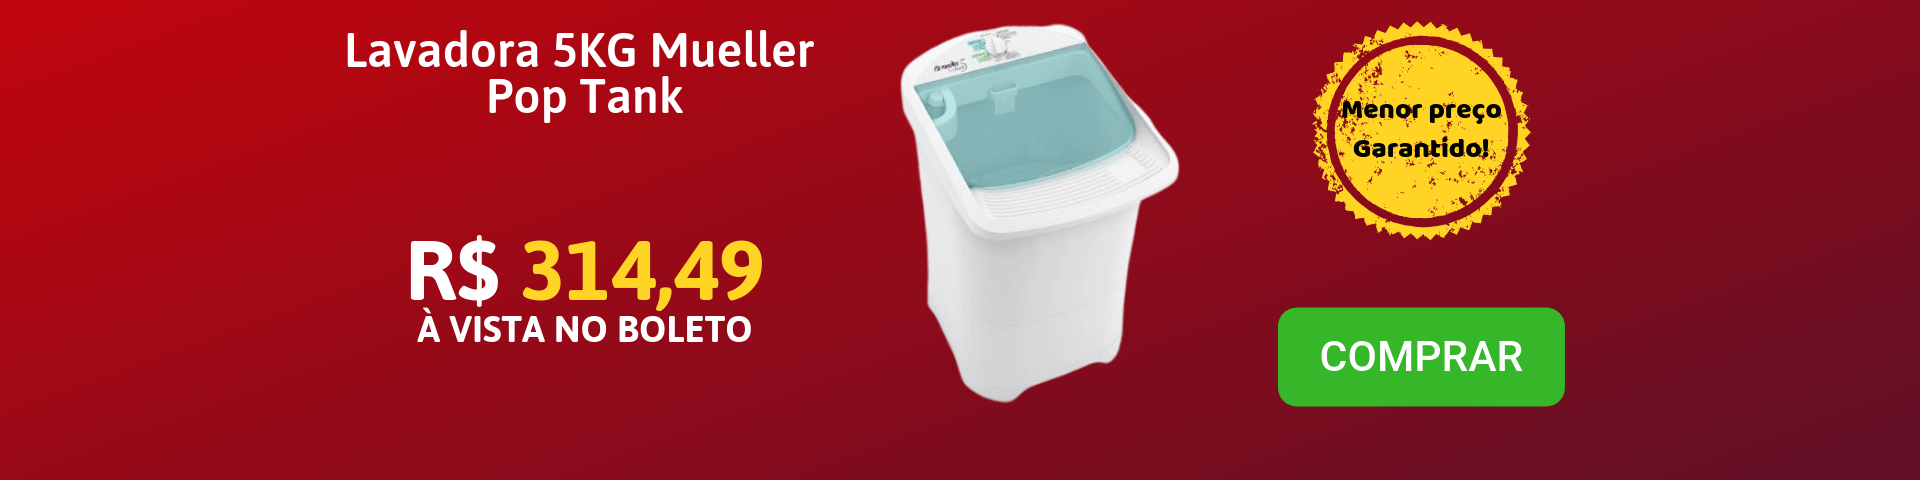 Promo LAVADORA 5KG MUELLER POP TANK - 600005011